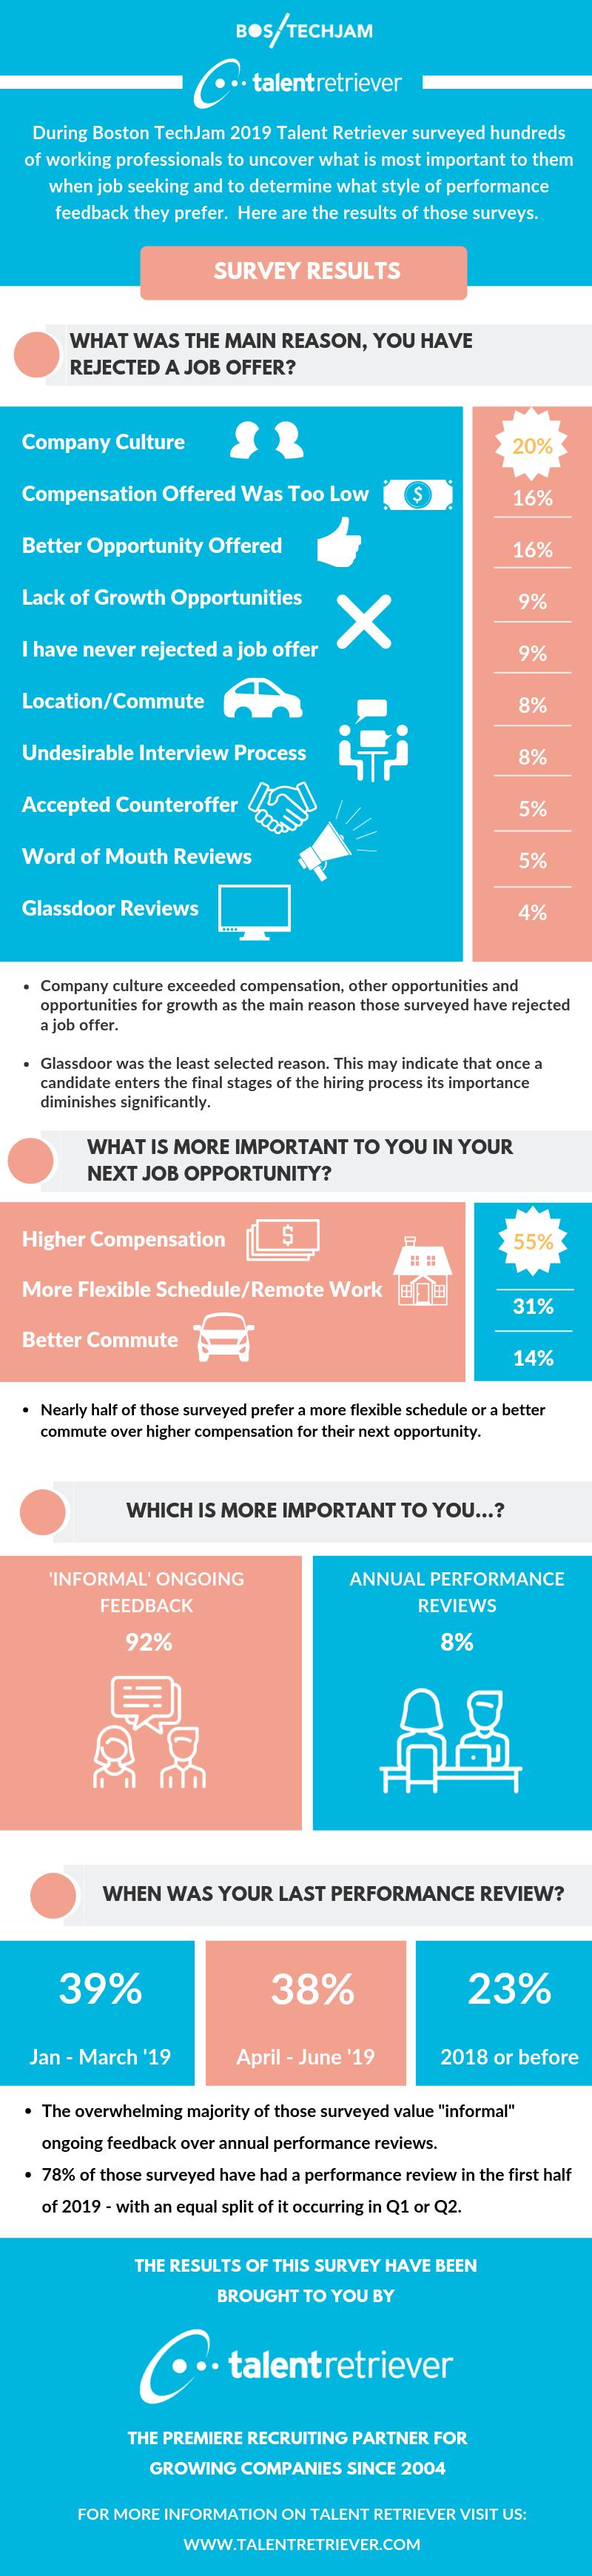 techjam 2019 survey results